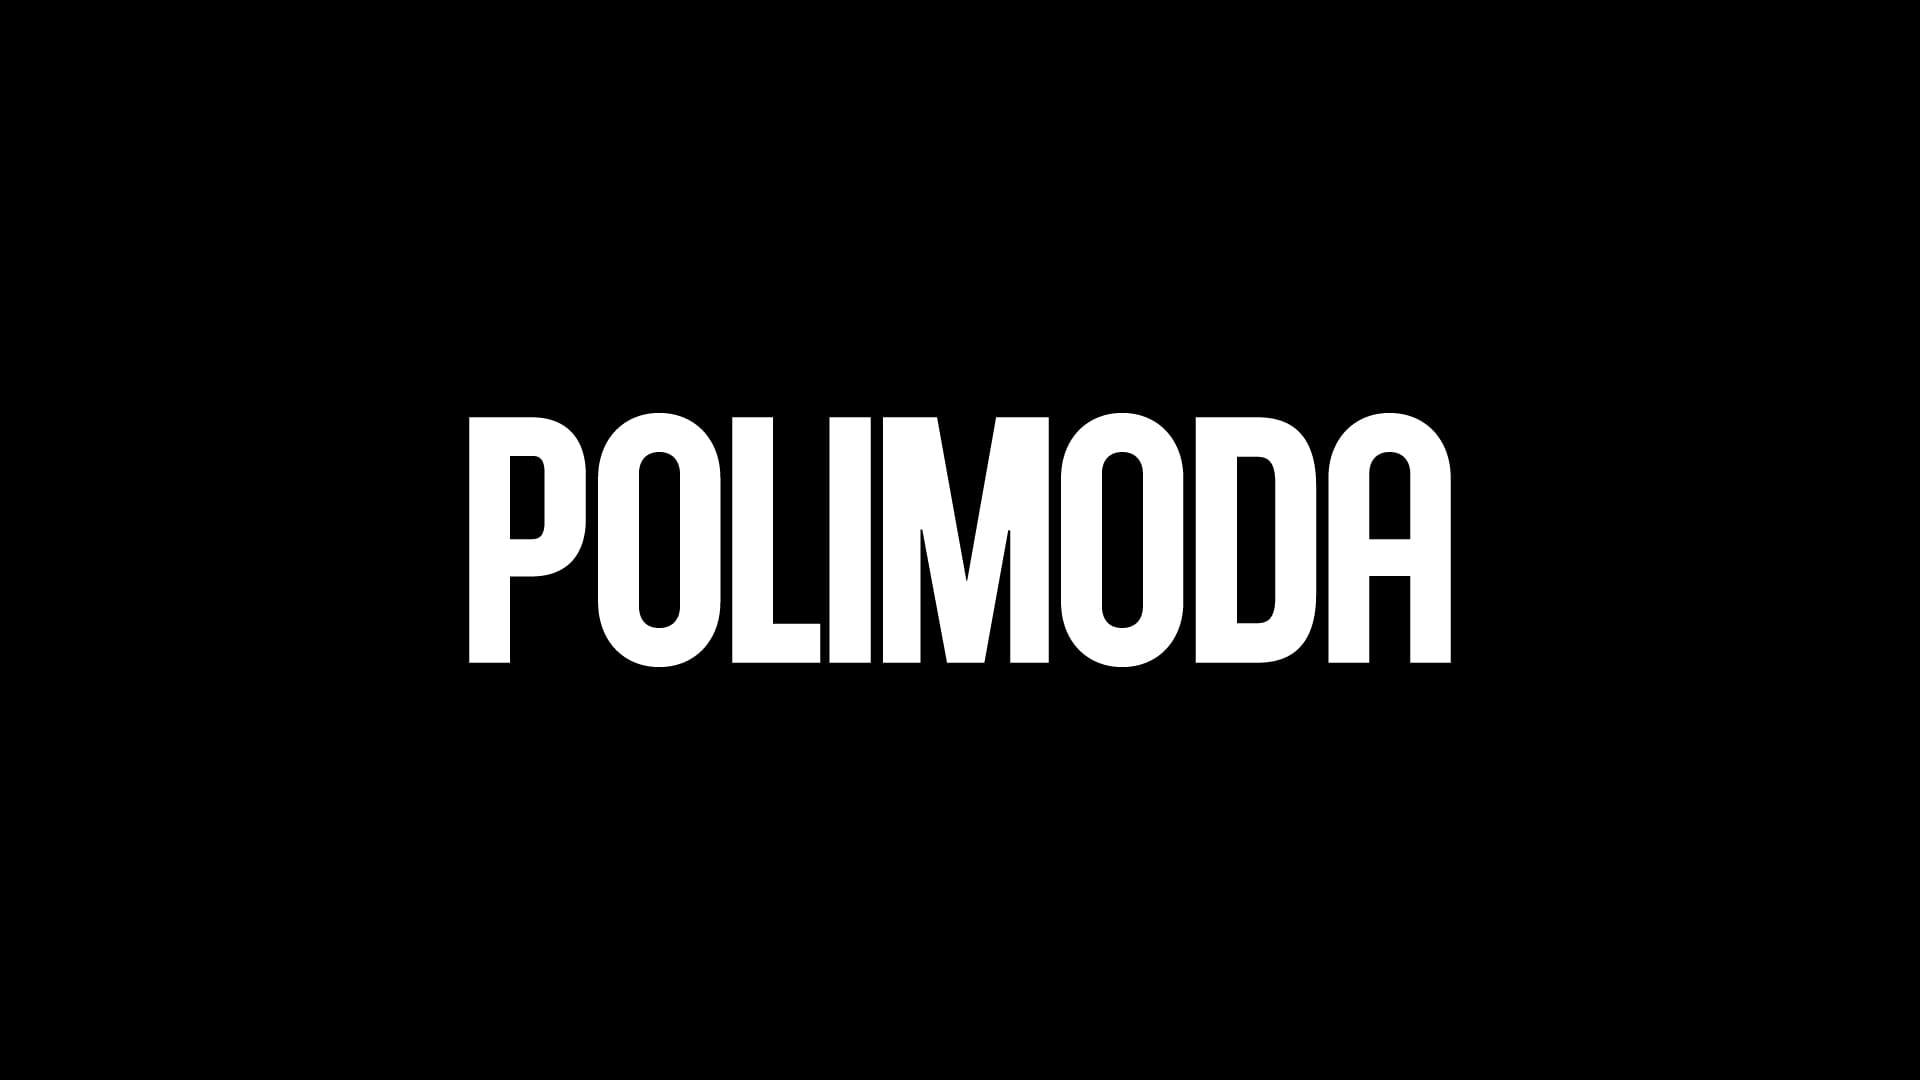 Polimoda 01